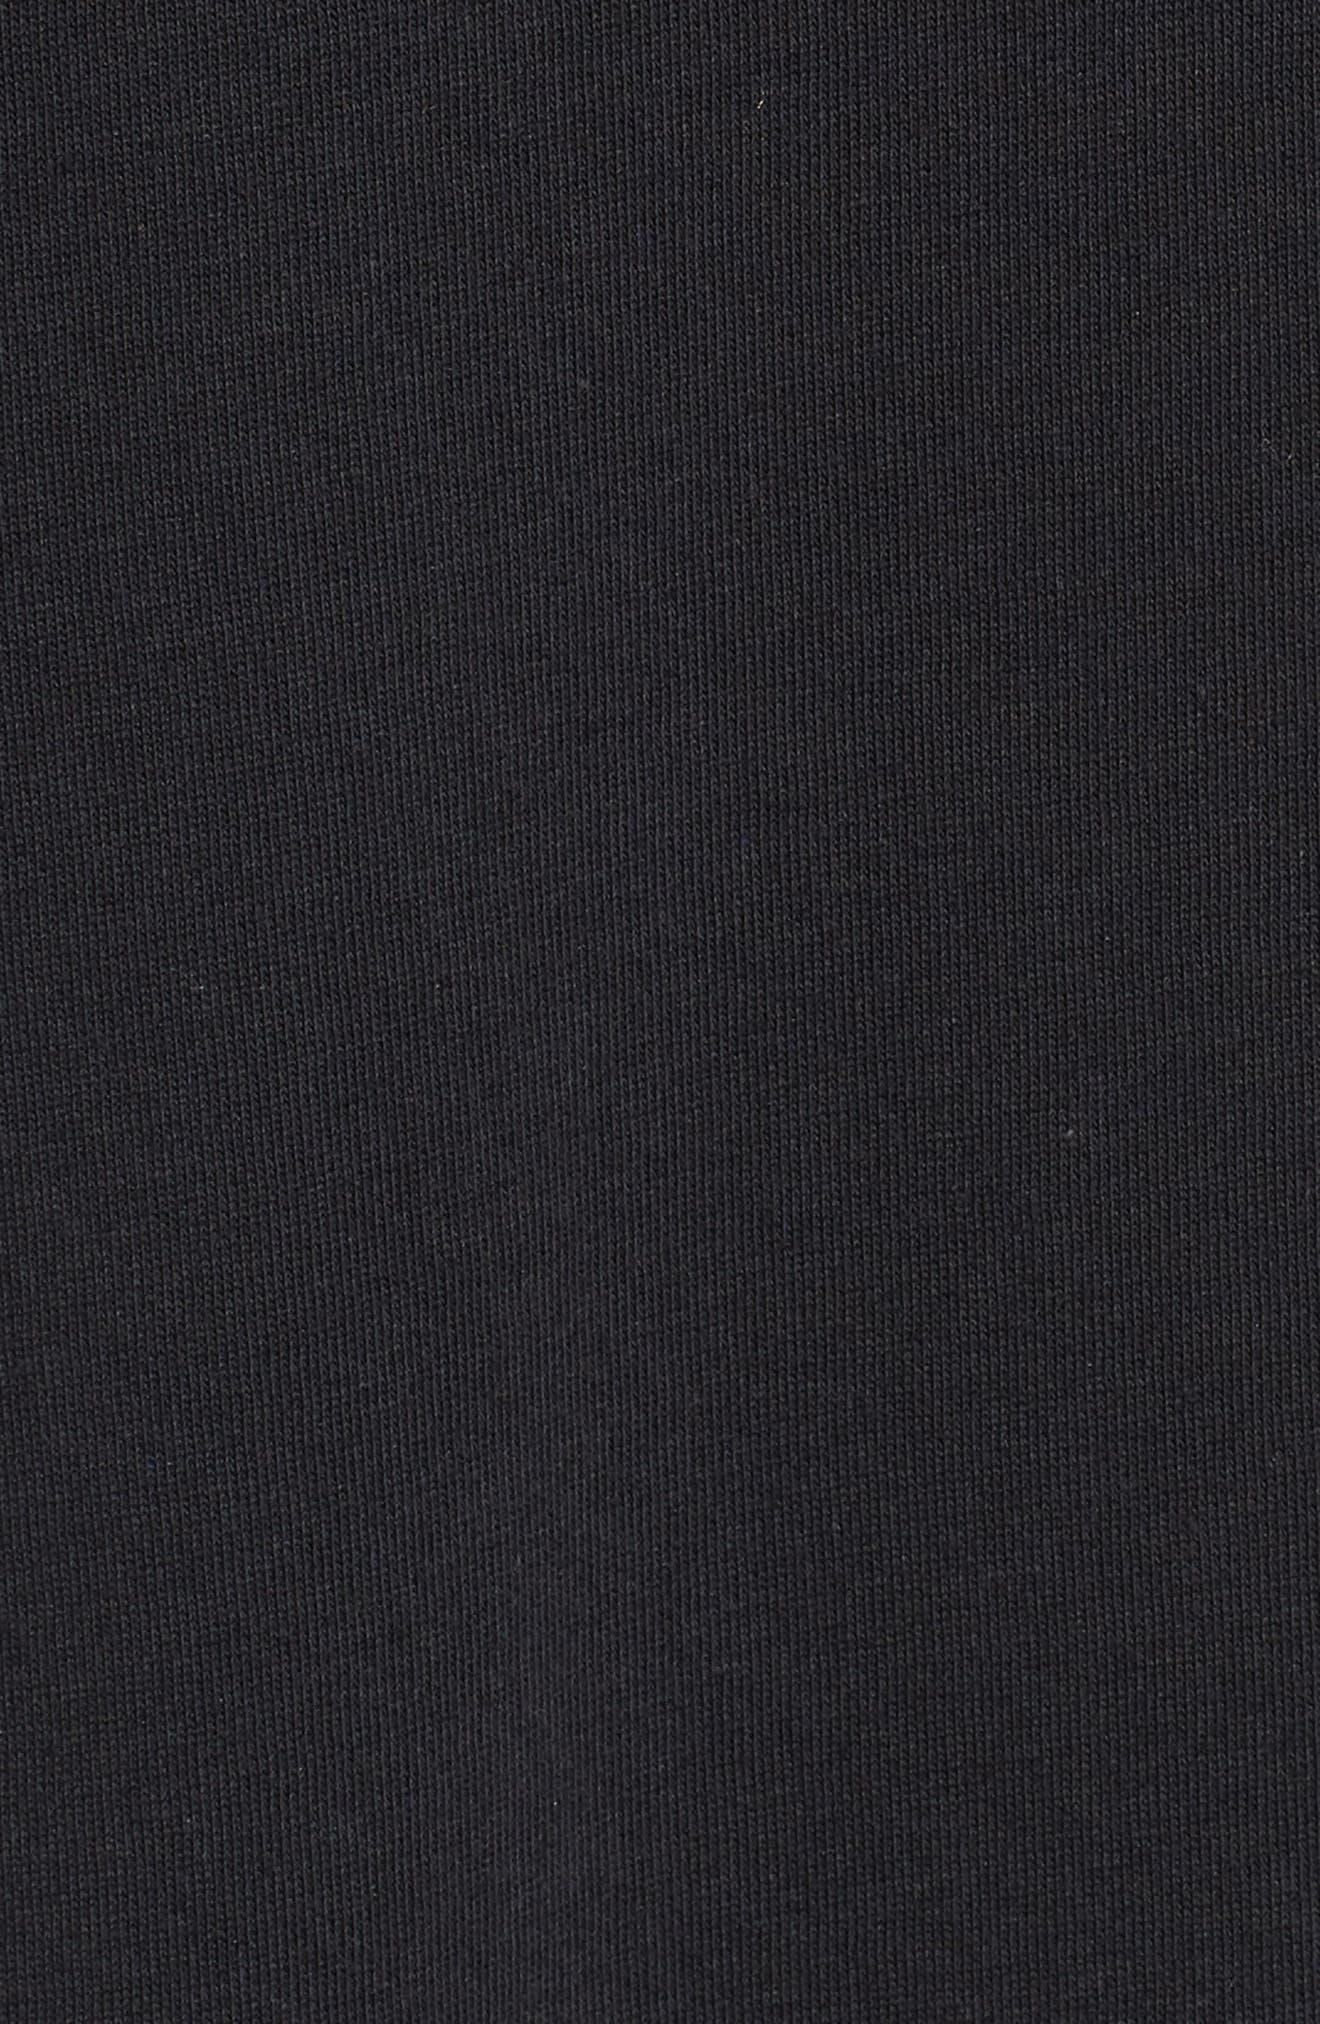 Nike 'SB Logo' T-Shirt,                             Alternate thumbnail 5, color,                             BLACK/ YELLOW/ OCHRE